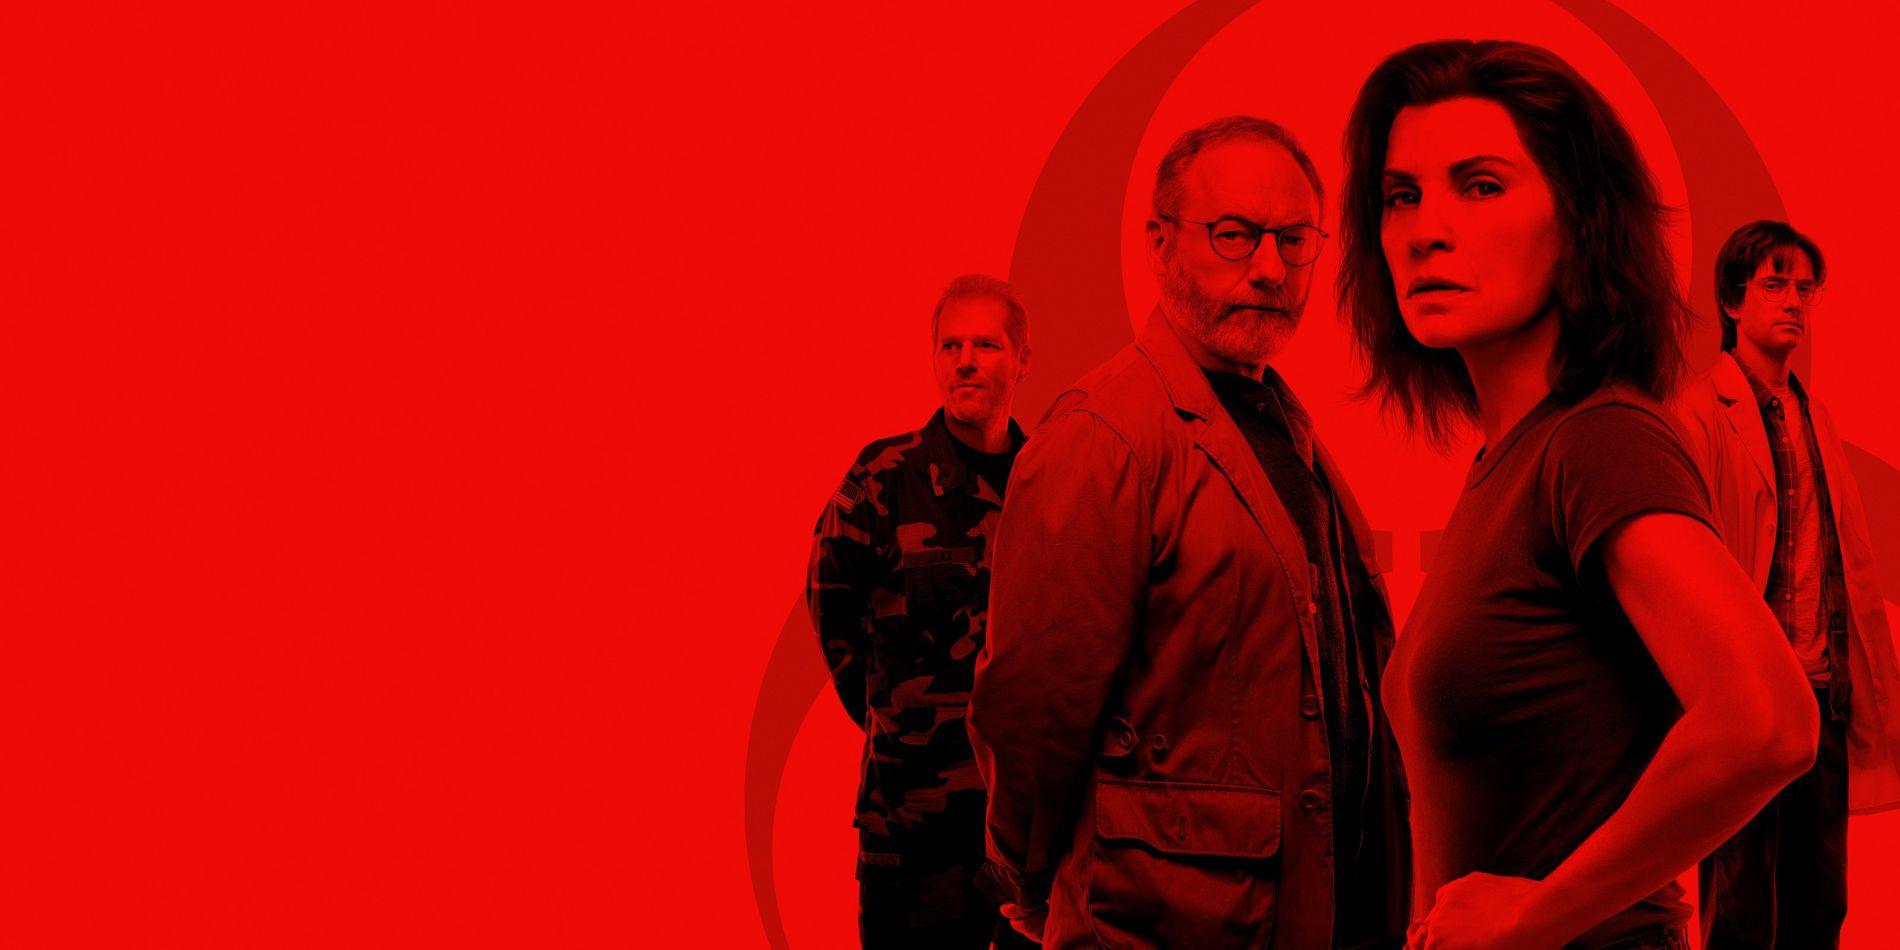 The Hot Zone – Tödliches Virus: Ab dem 16. September immer montags ab 21.00 Uhr auf National Geographic.